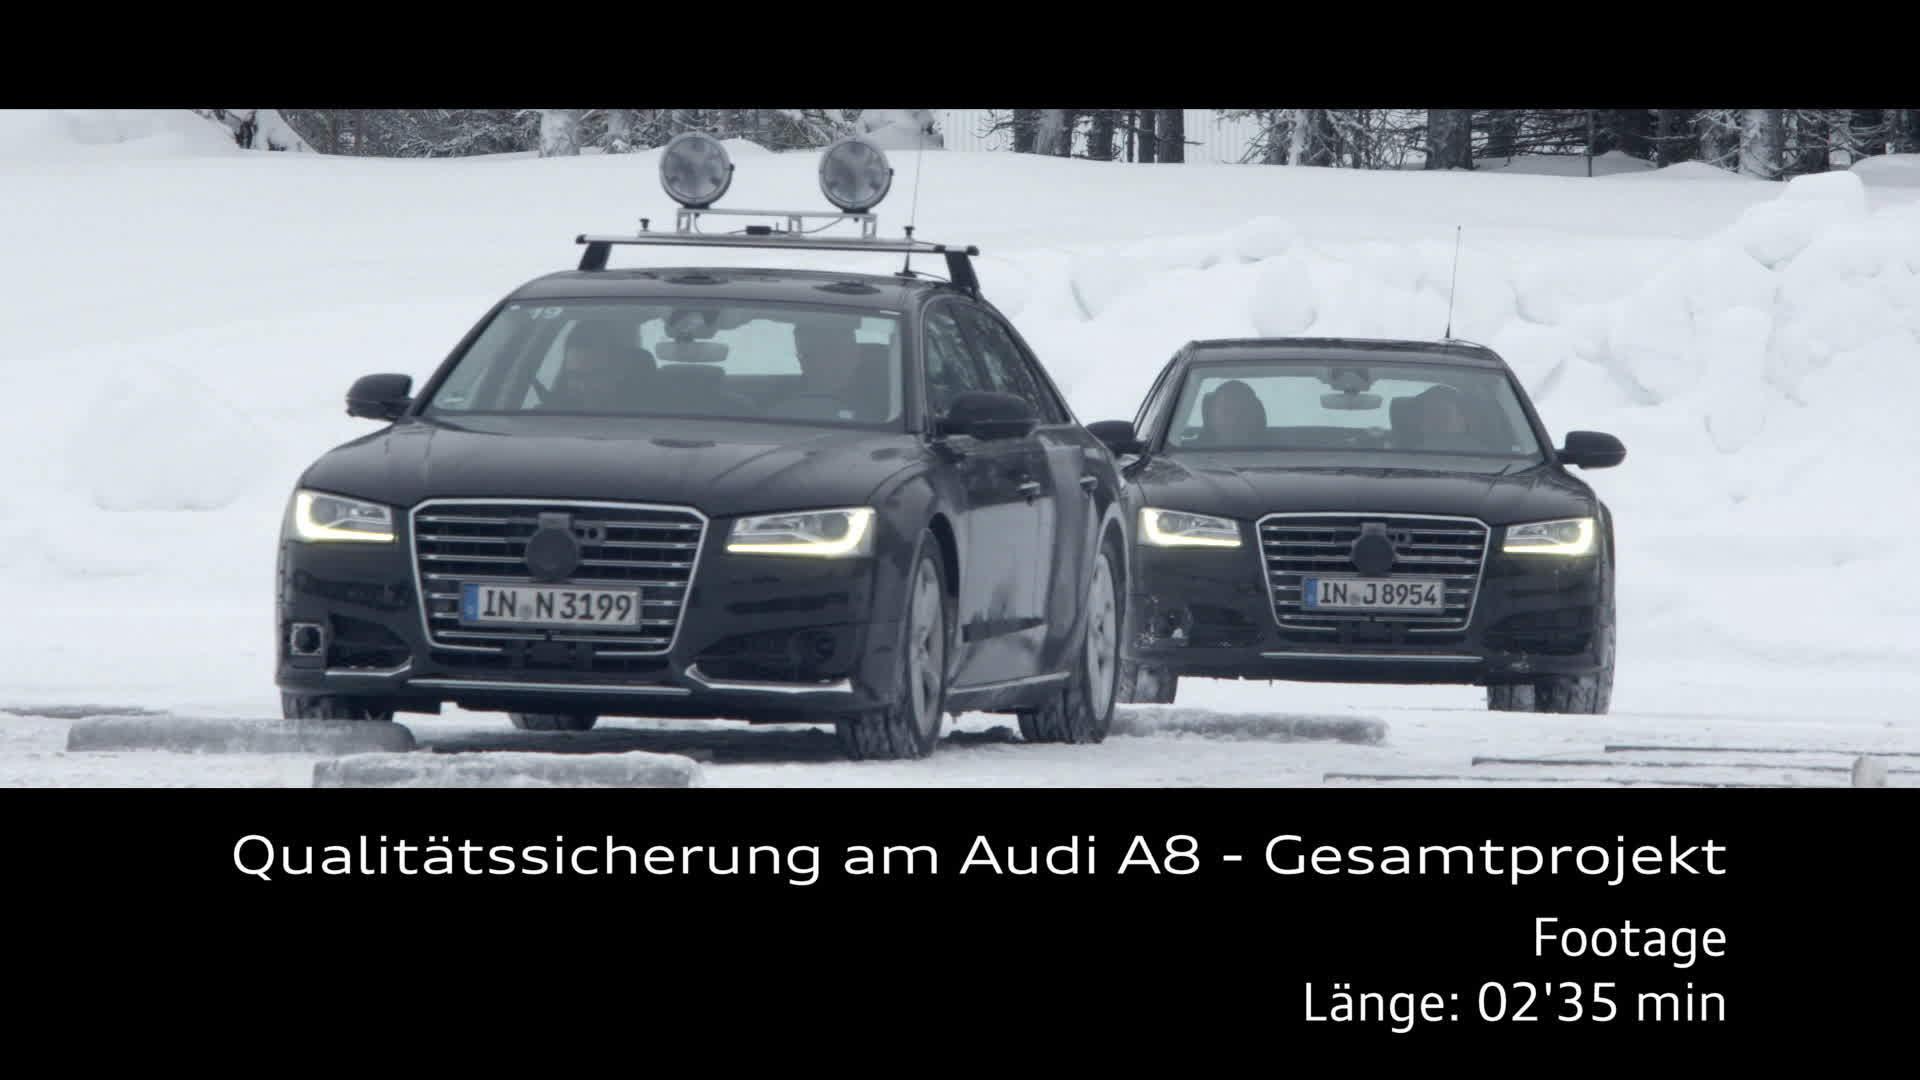 Qualitätssicherung am Audi A8 Gesamtprojekt